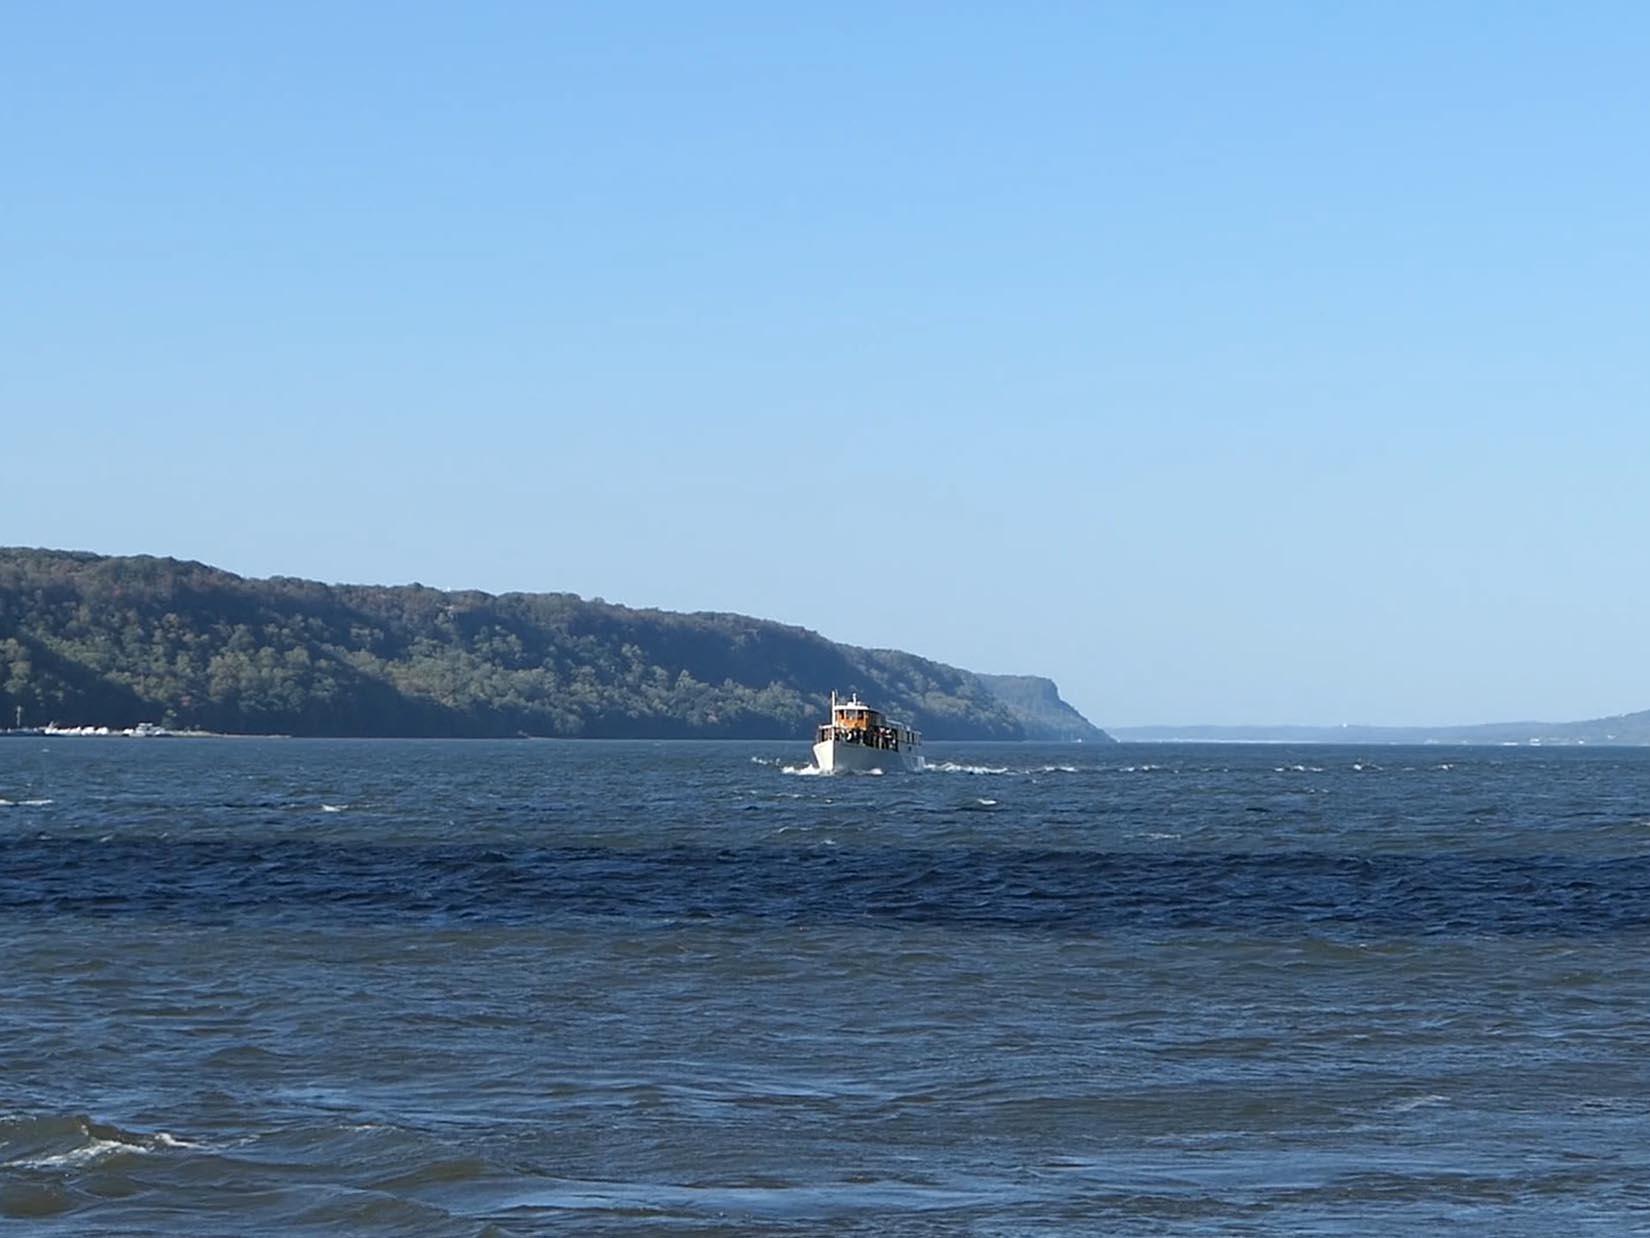 Boat in Ocean